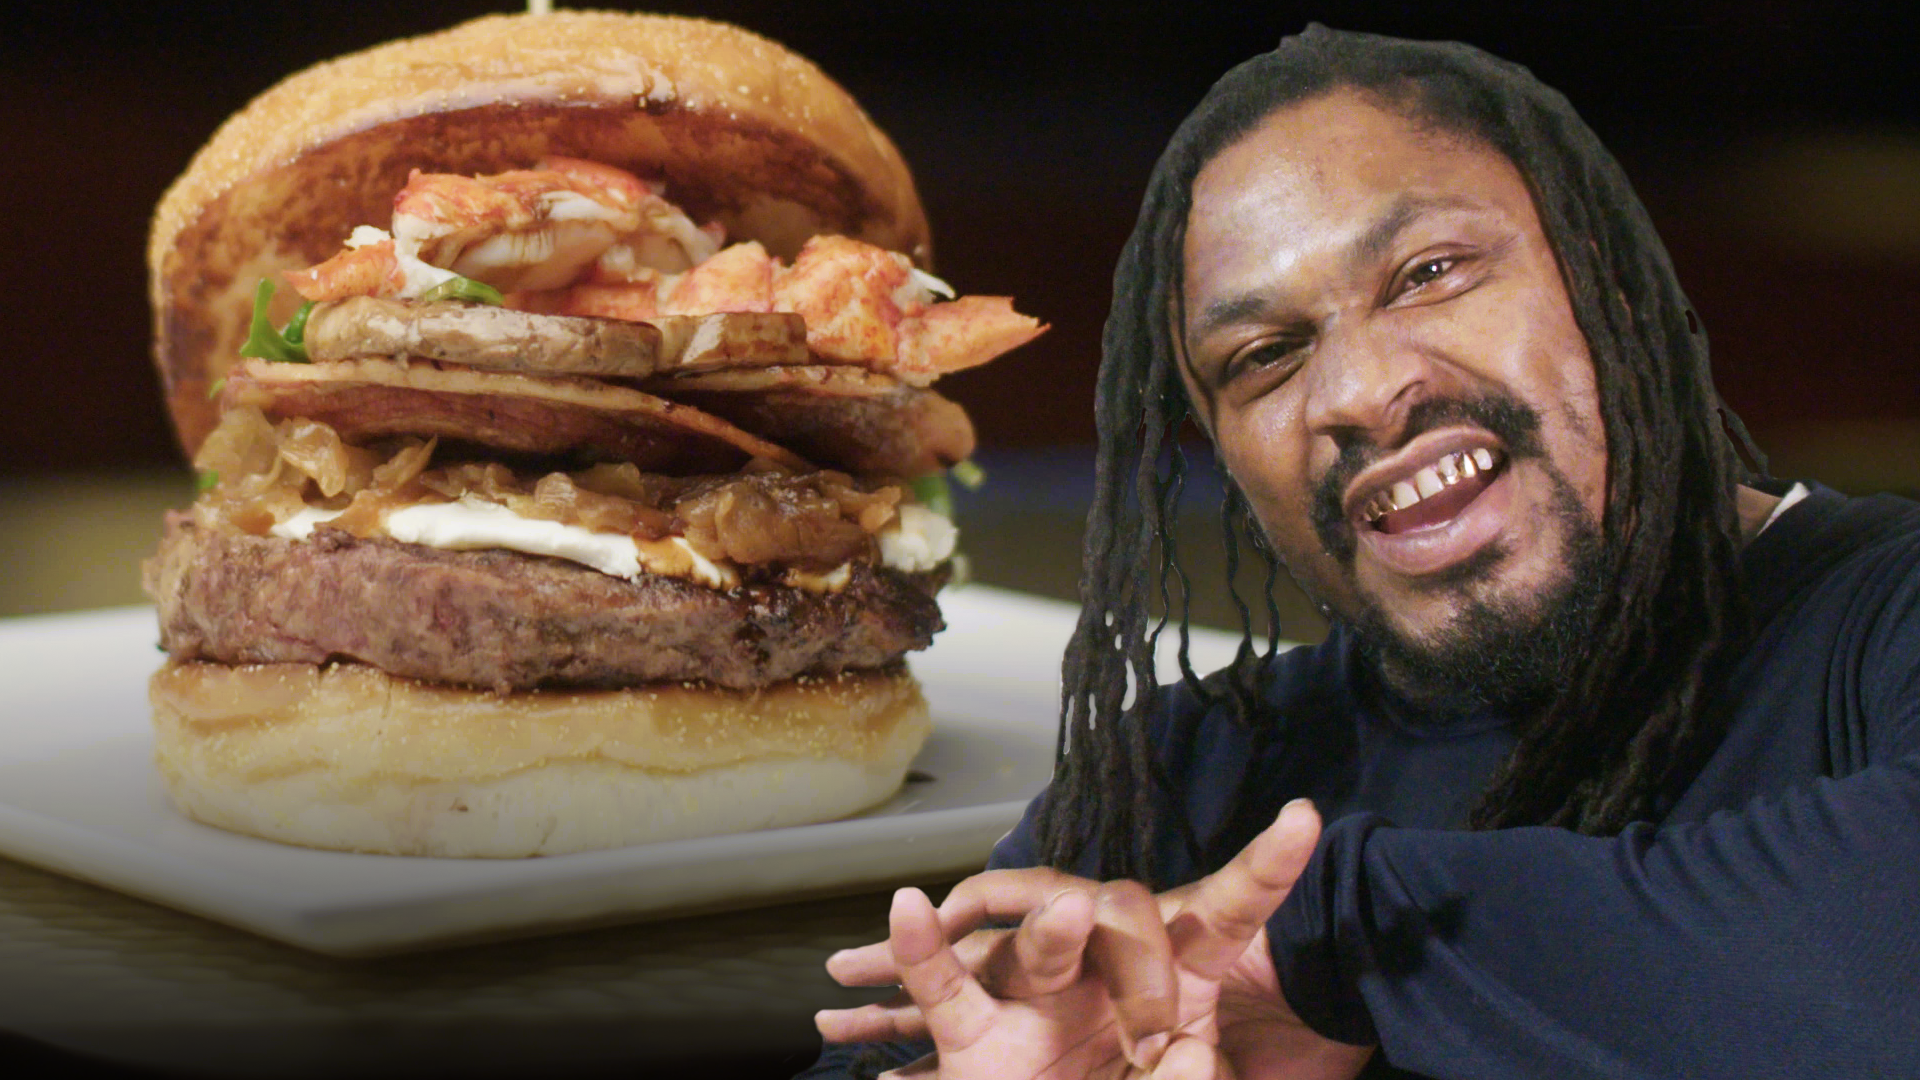 Marshawn Lynch Goes Beast Mode on a $1200 Burger